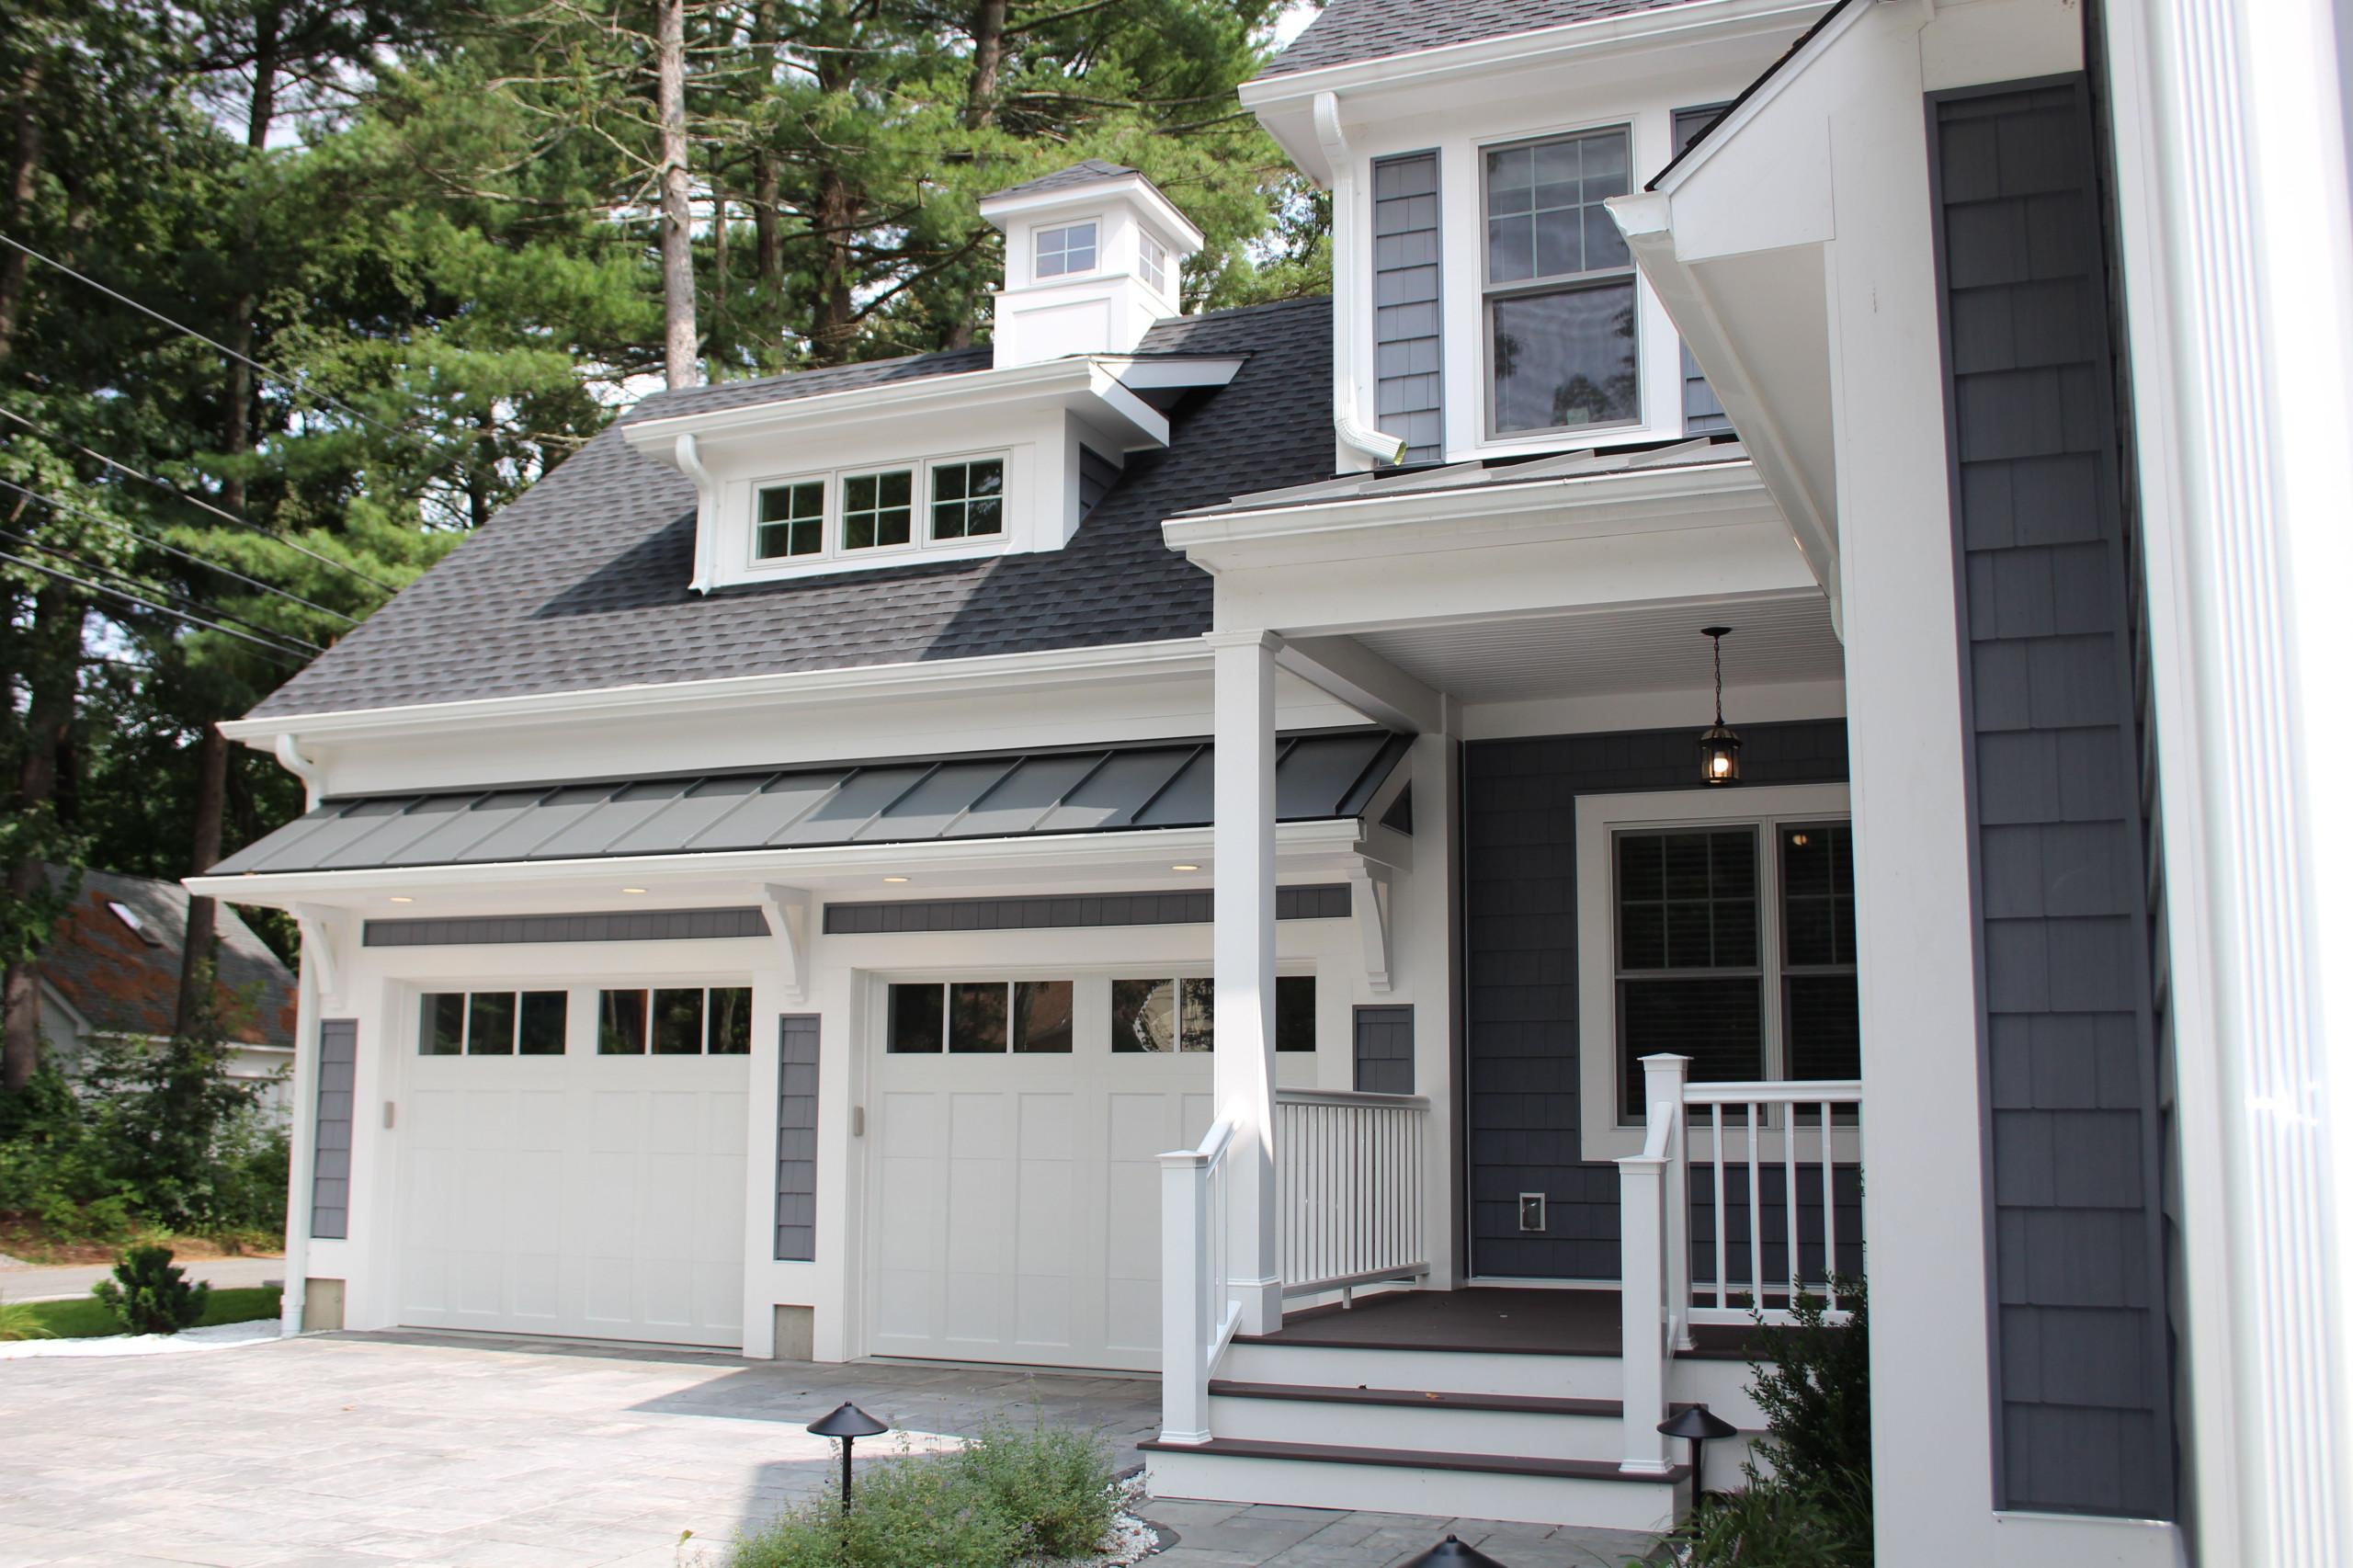 Connecticut Lake house